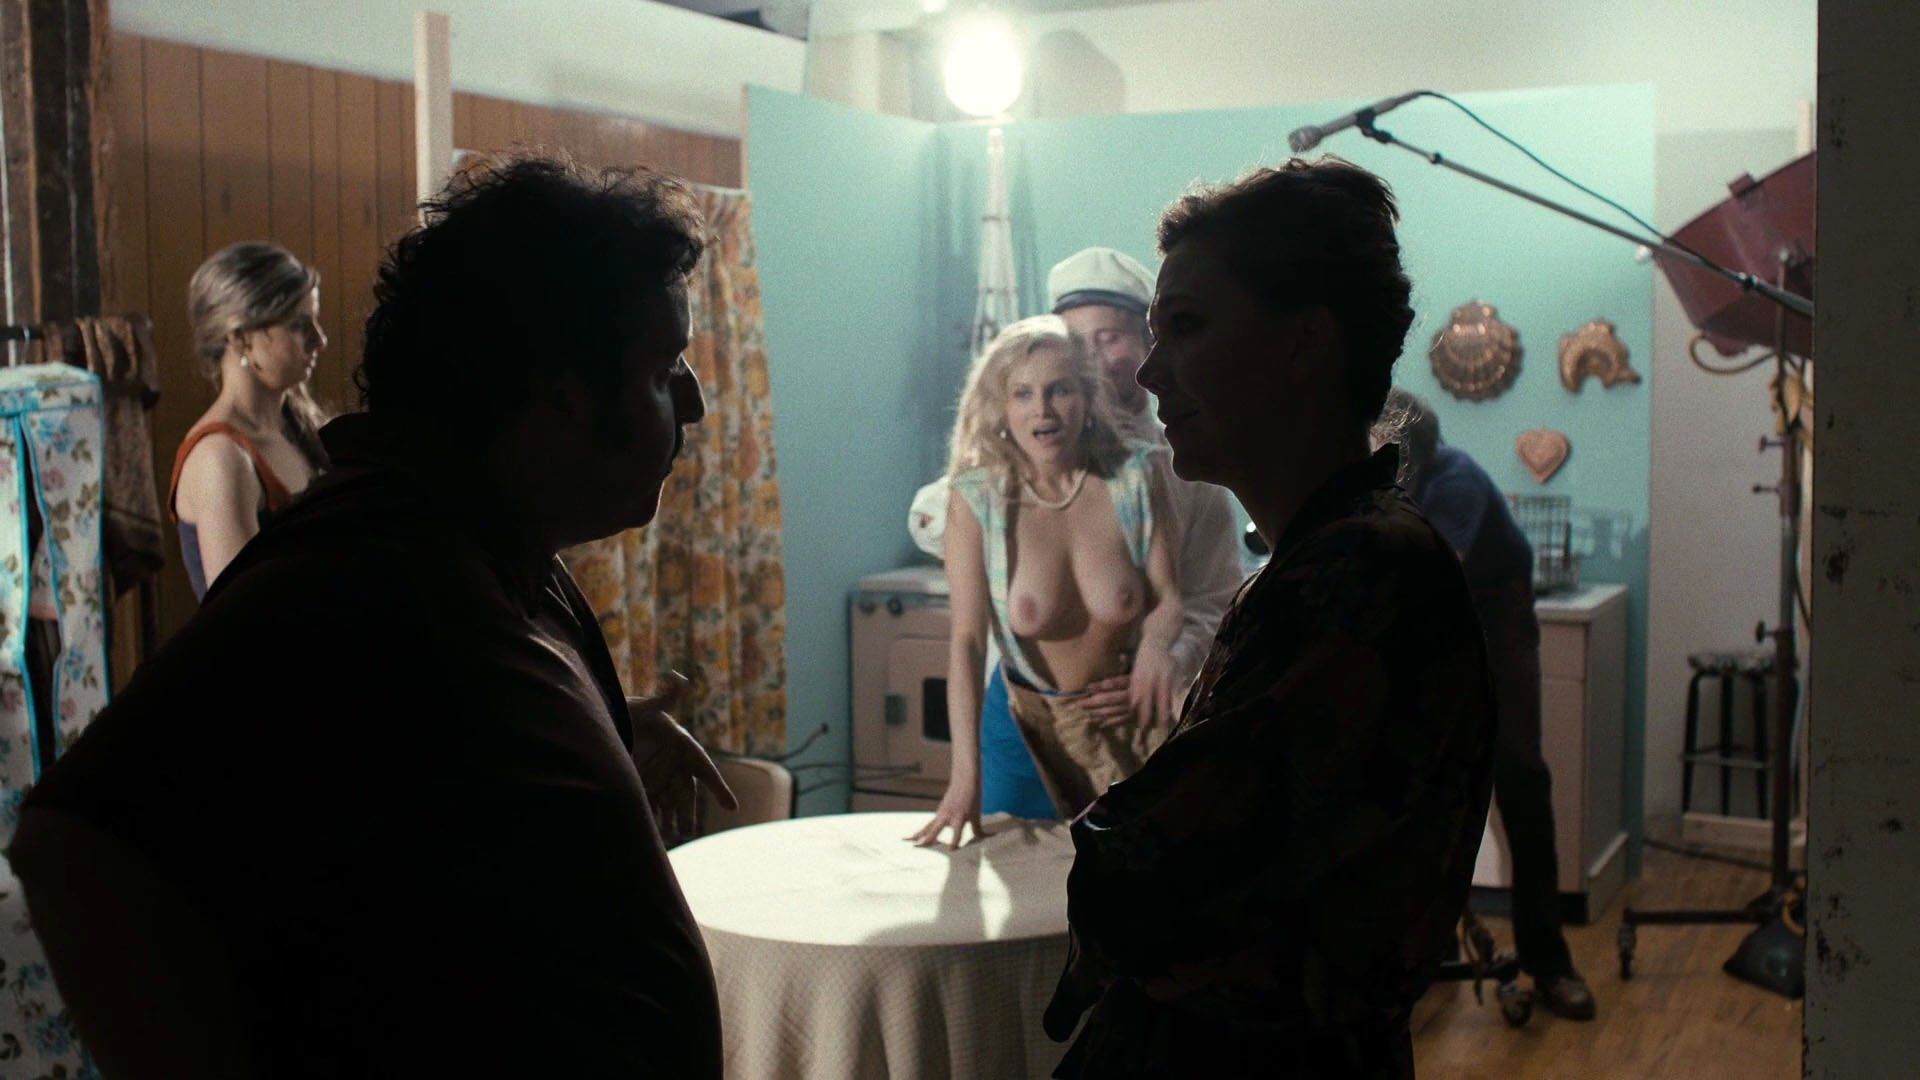 Olivia cheng nude marco polo s01e034 - 2 1